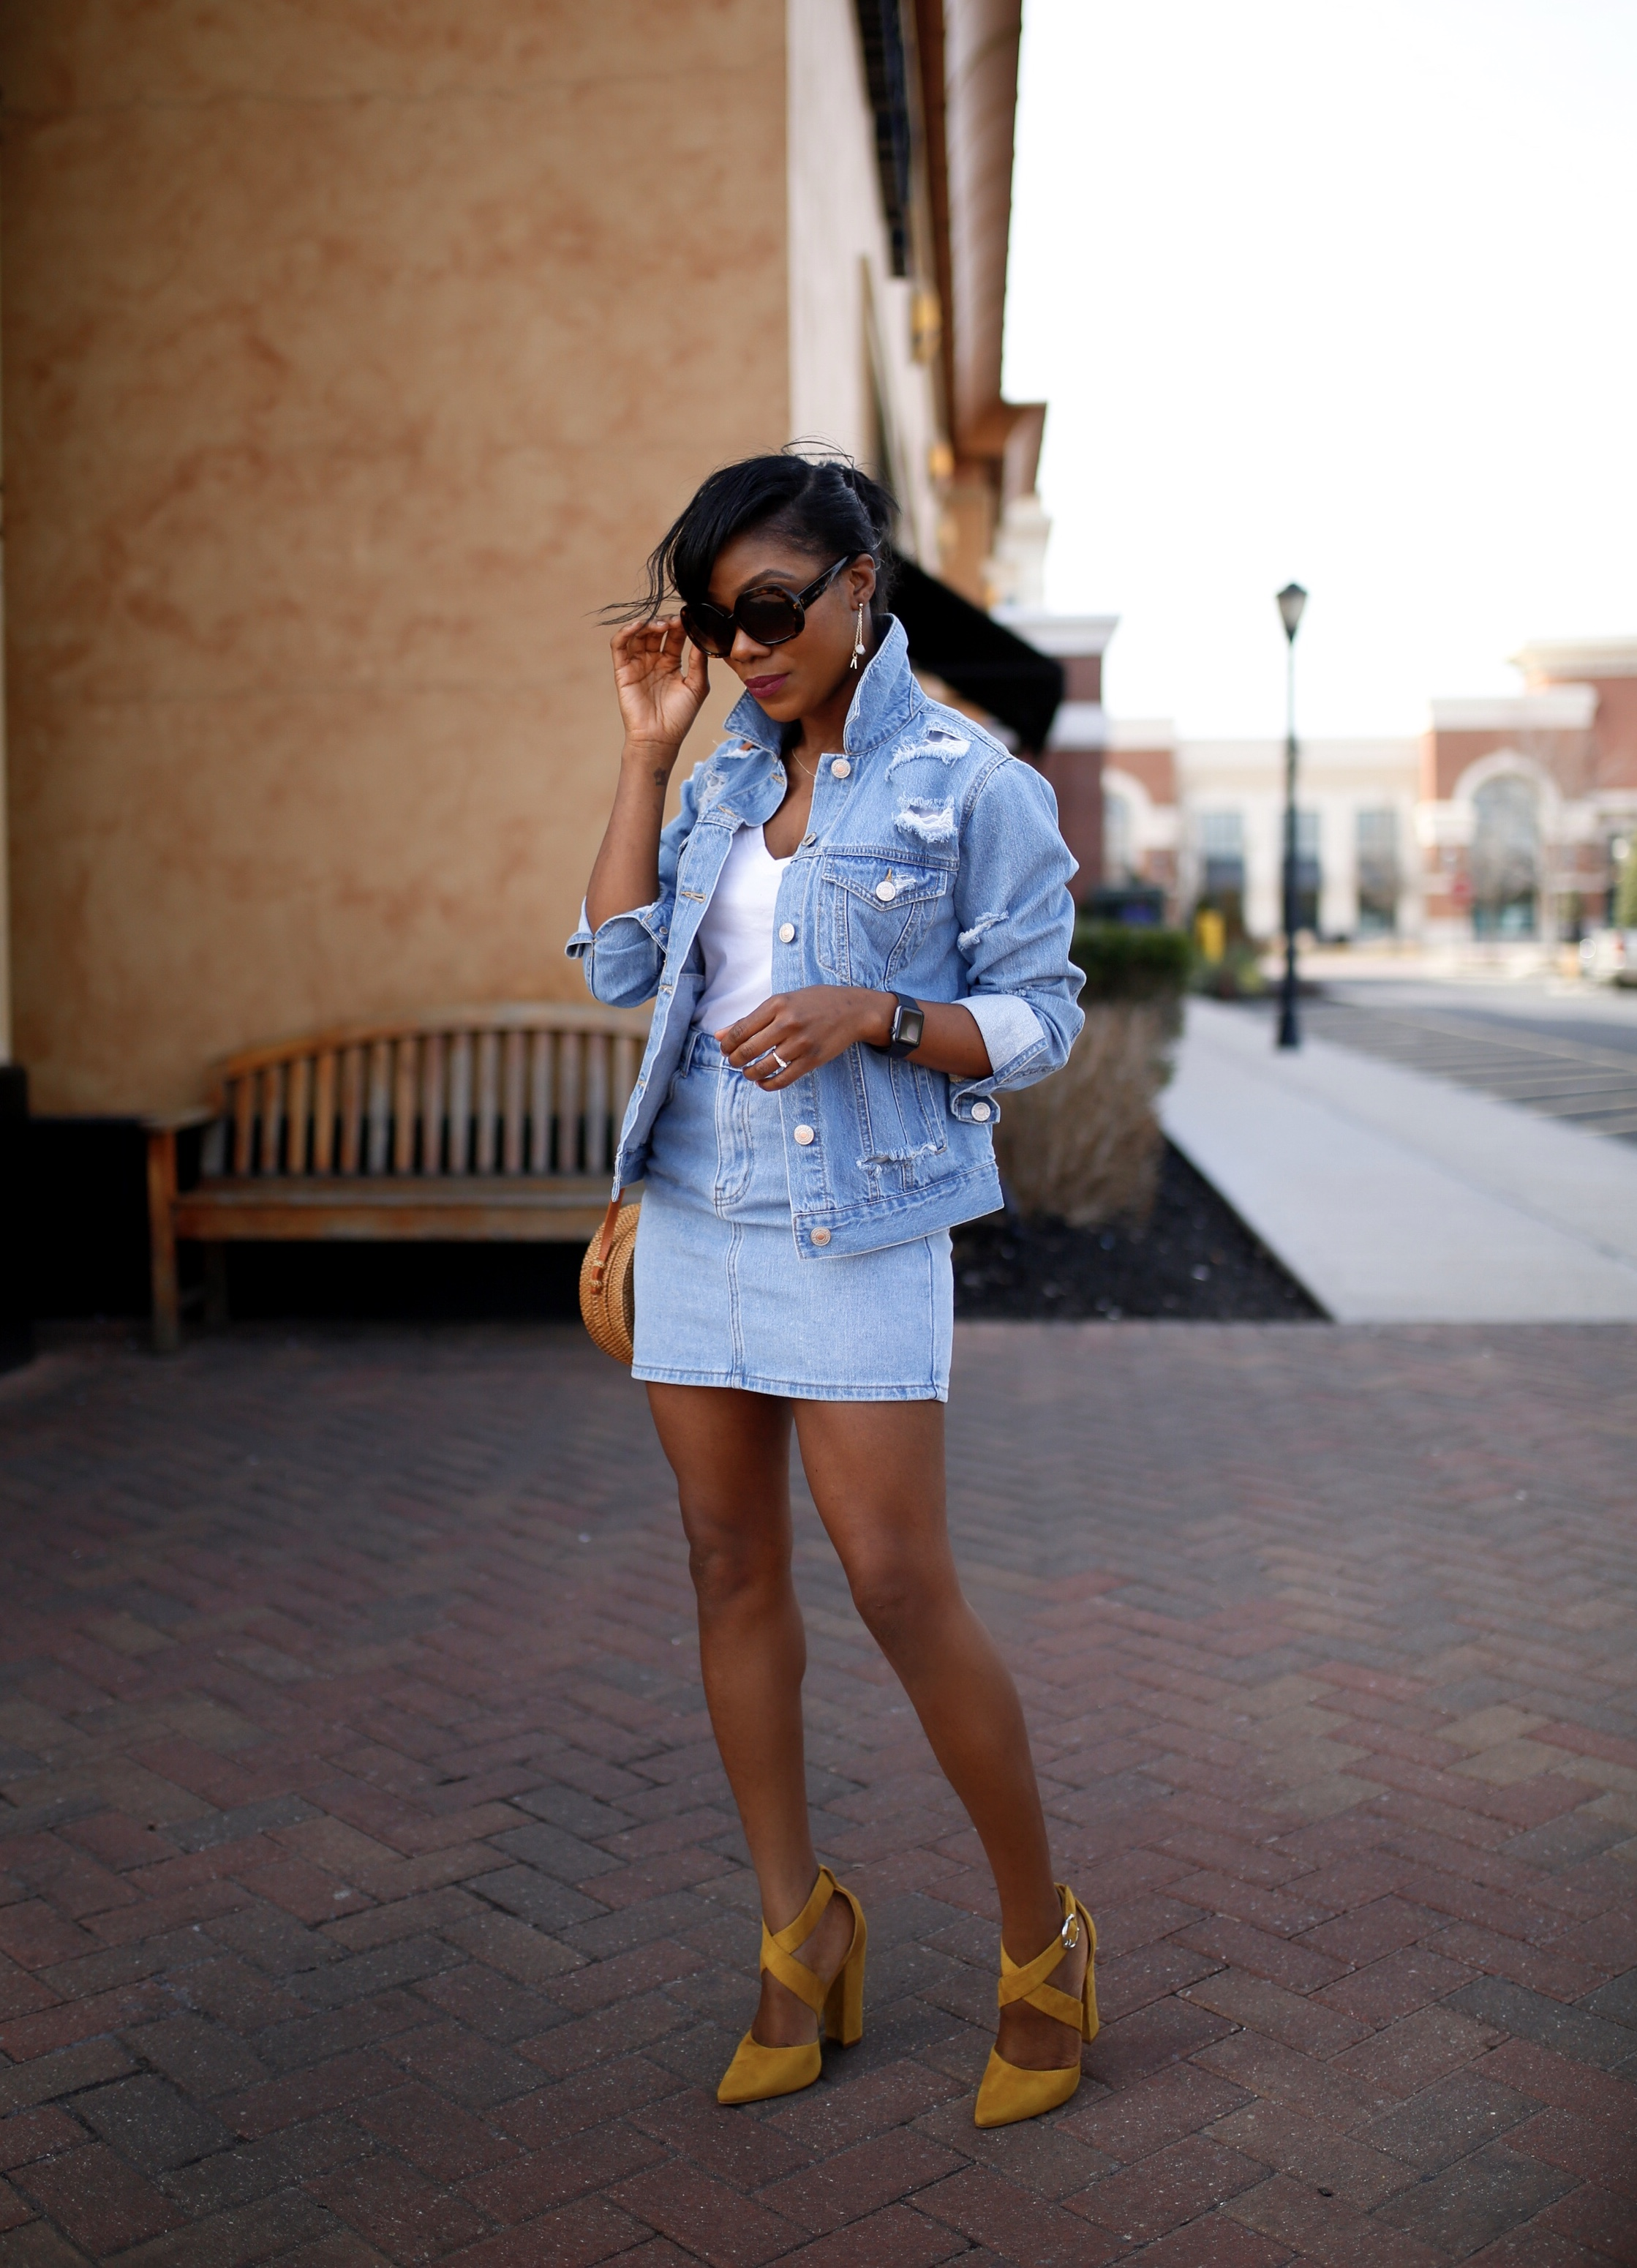 How to wear denim on denim, ways to style your favorite denim jacket with denim skirt.